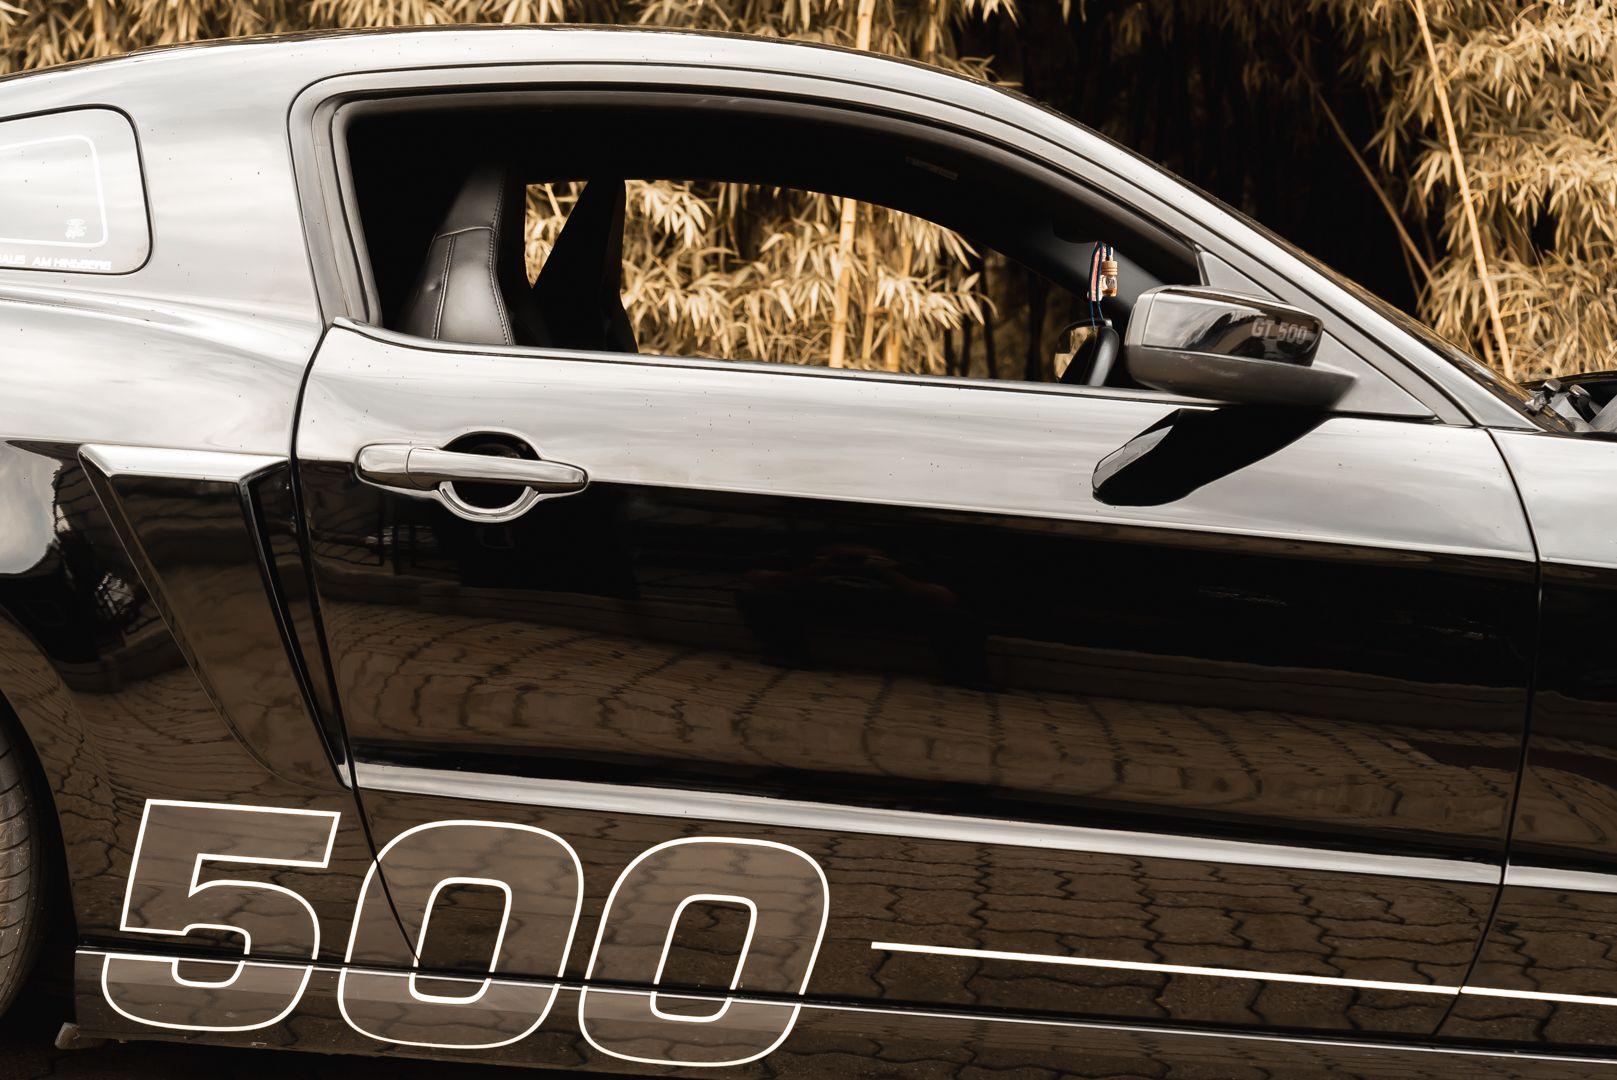 2012 Ford Mustang 5.0 V8 82068